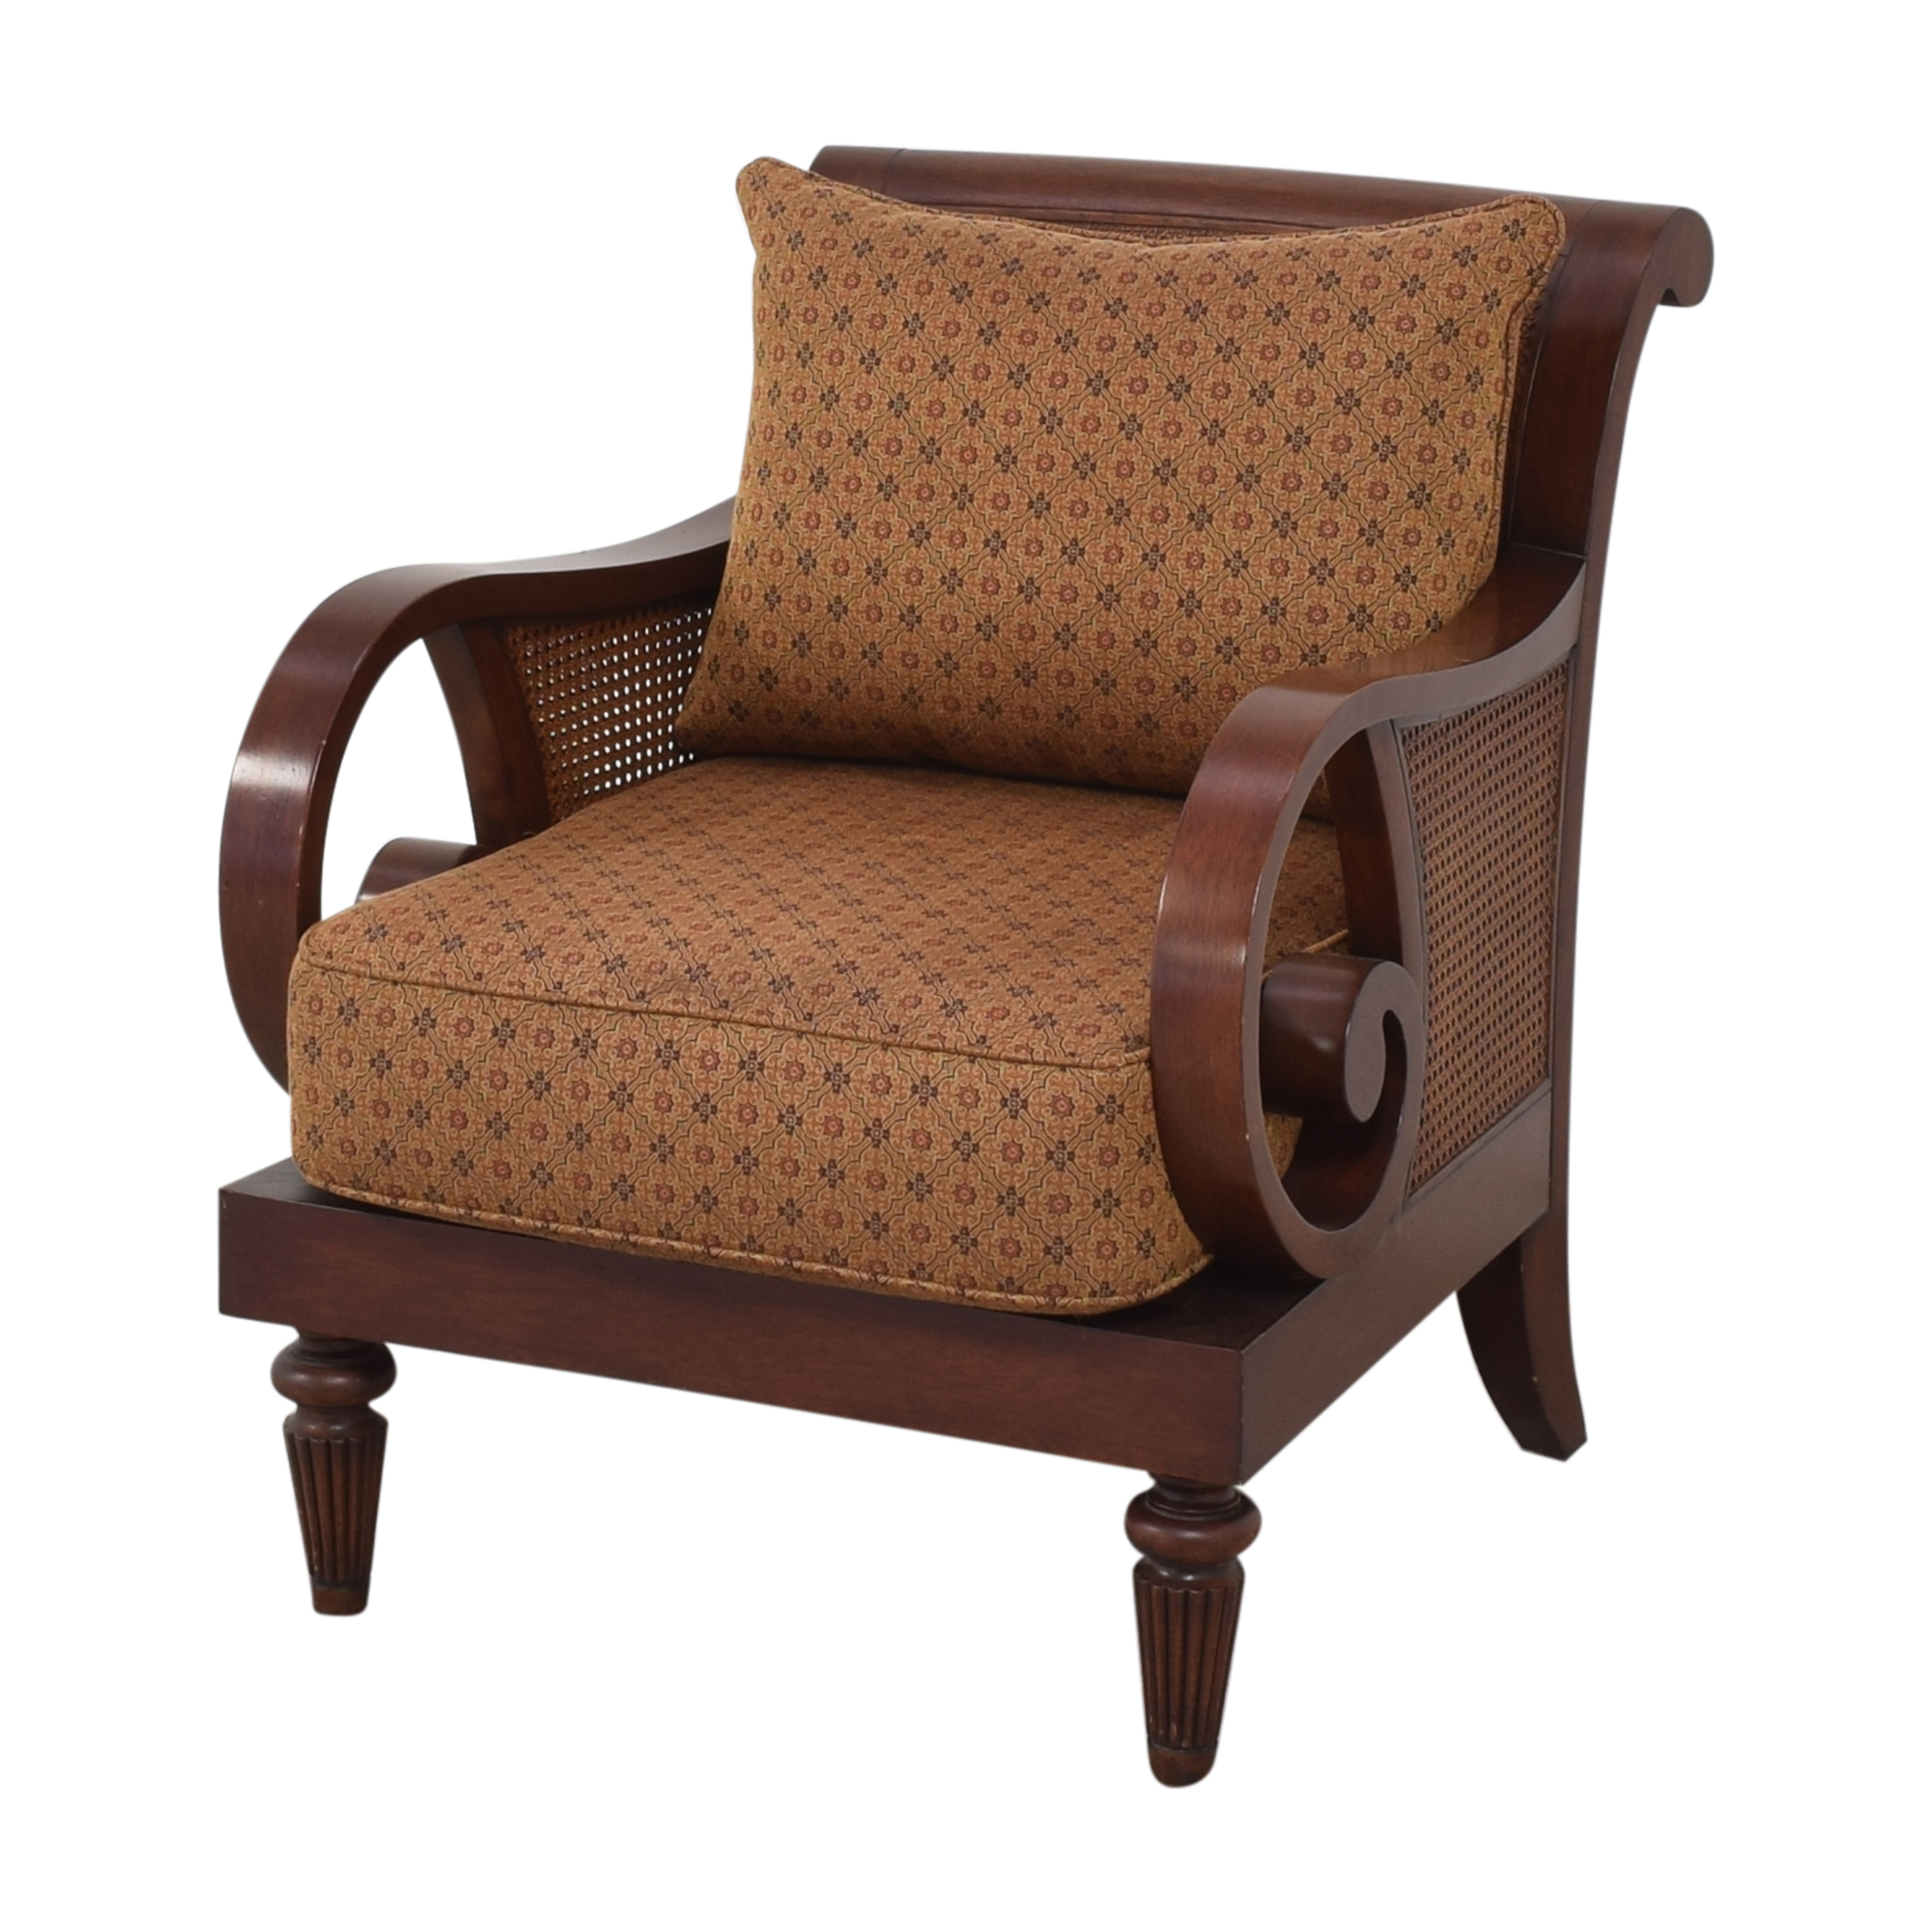 buy Ethan Allen Berwick Chair Ethan Allen Chairs